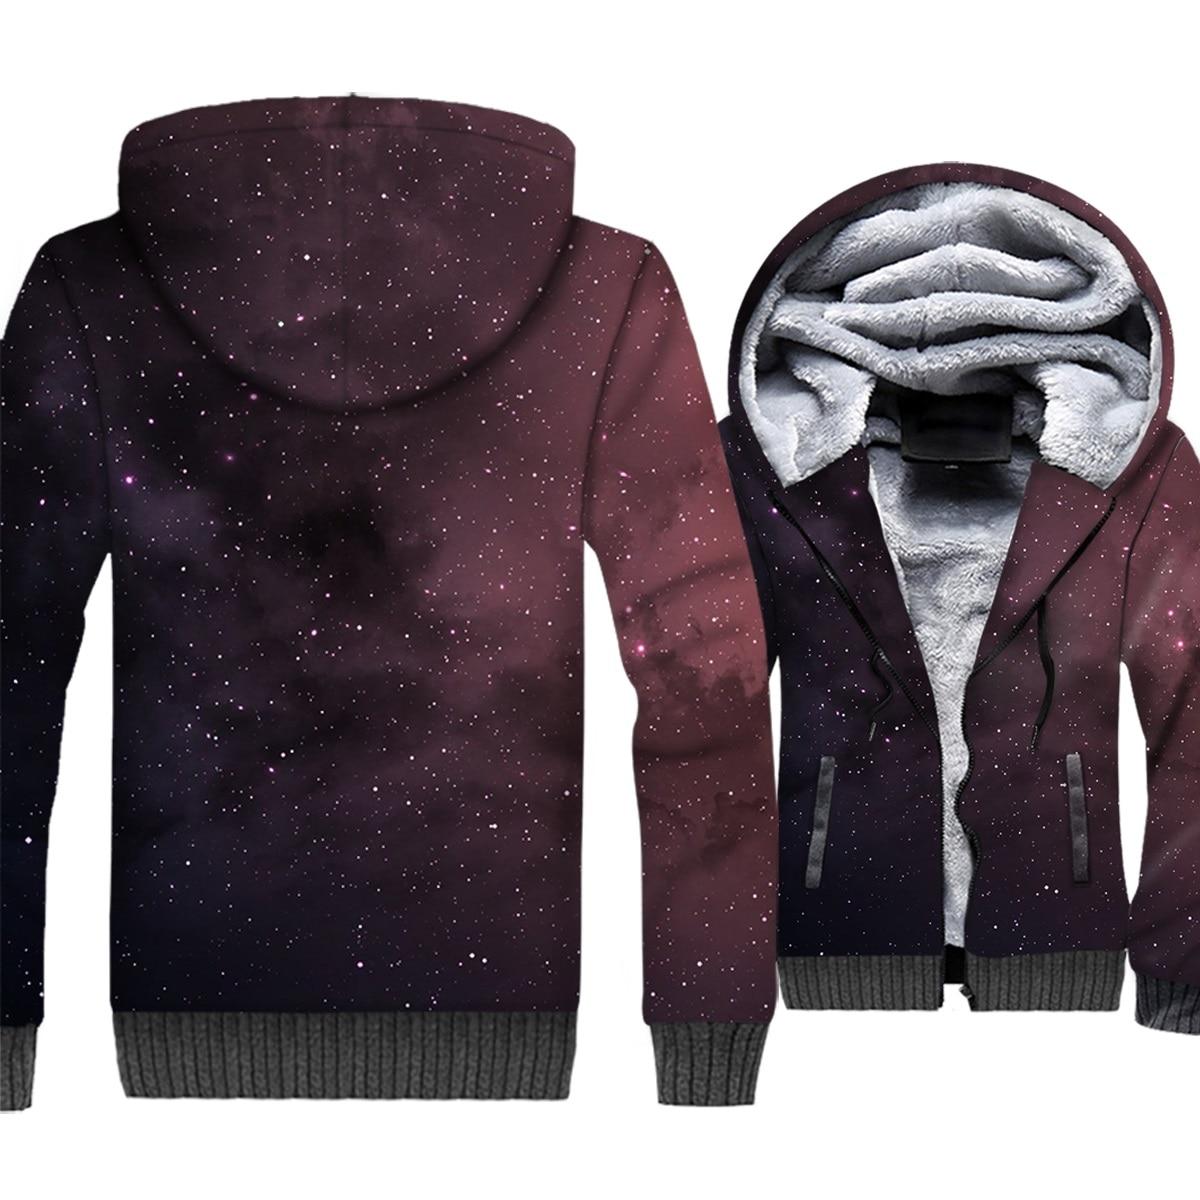 Space Galaxy 3D Print Hoodie Men Colorful Nebula Cap ...